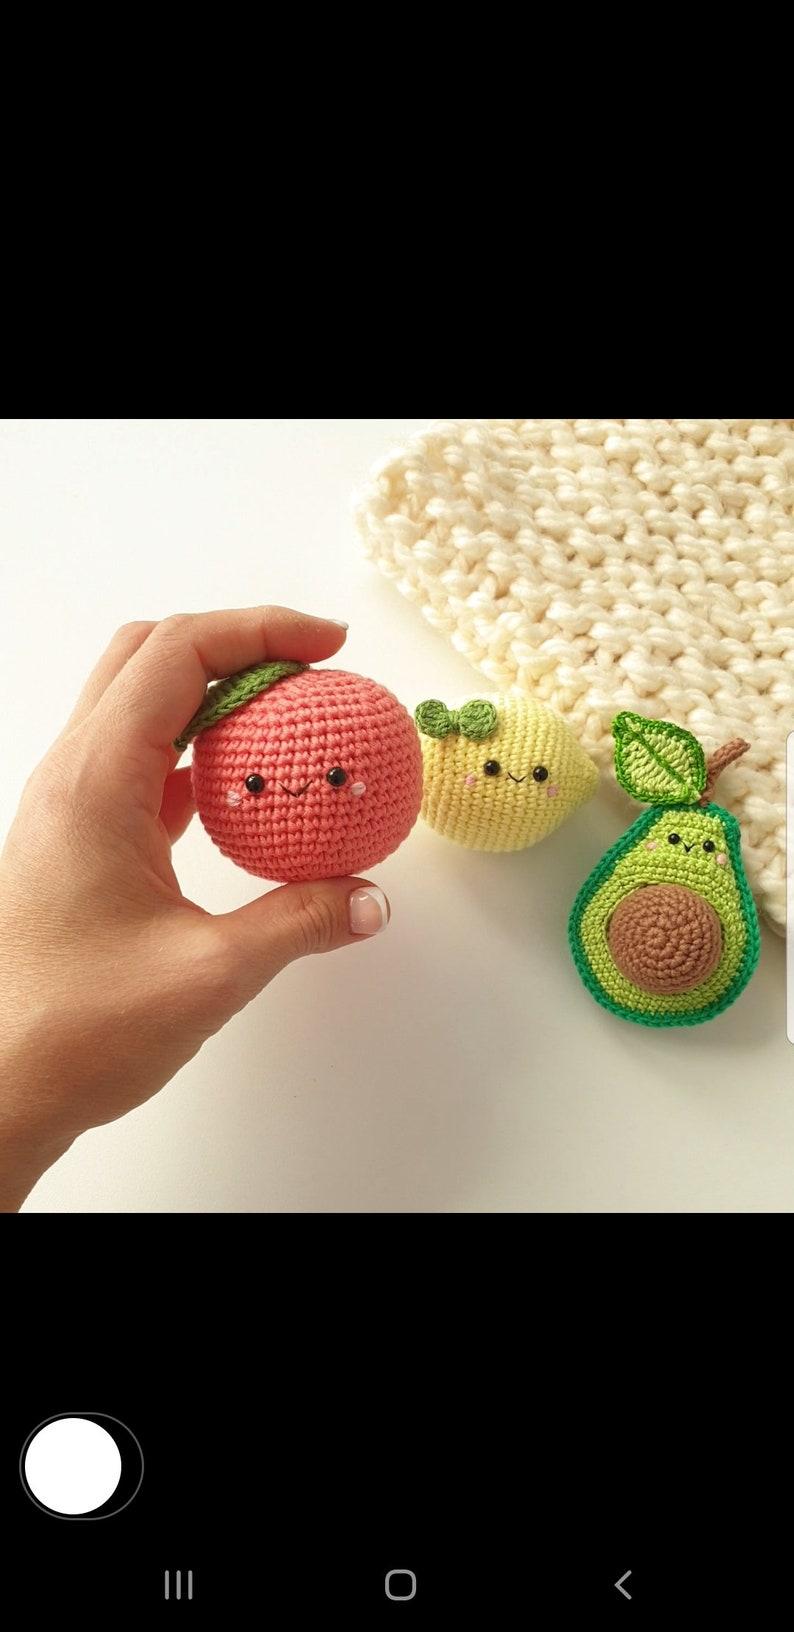 avocado lemon toy baby decor Crochet lemon,grapefruit Crochet fruits Rattle toys cute gift play Food Set kids gift kids toys